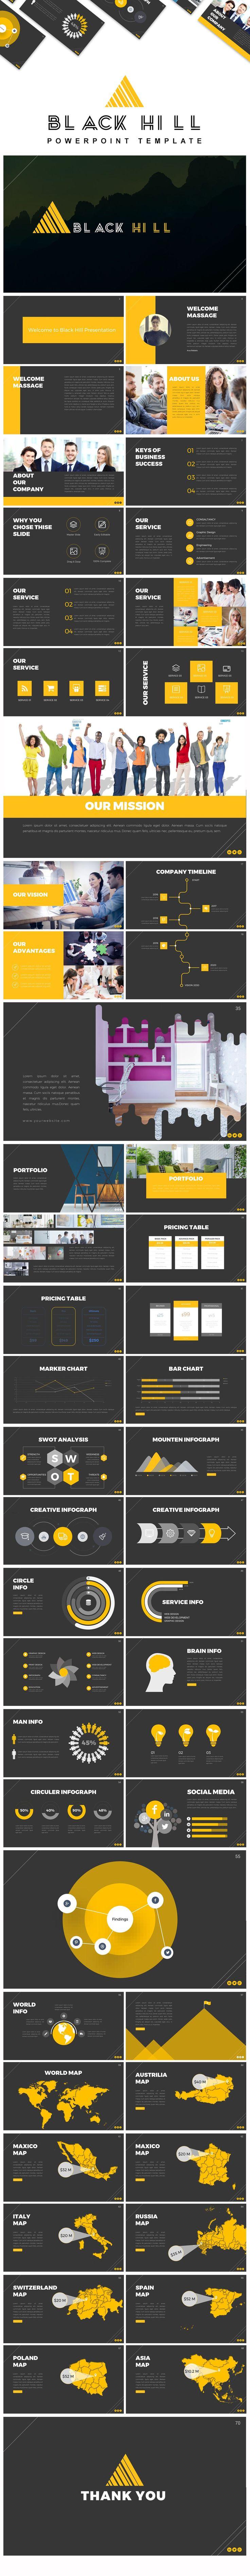 Black Hill Presentation PowerPoint Template FinanceTemplate 251